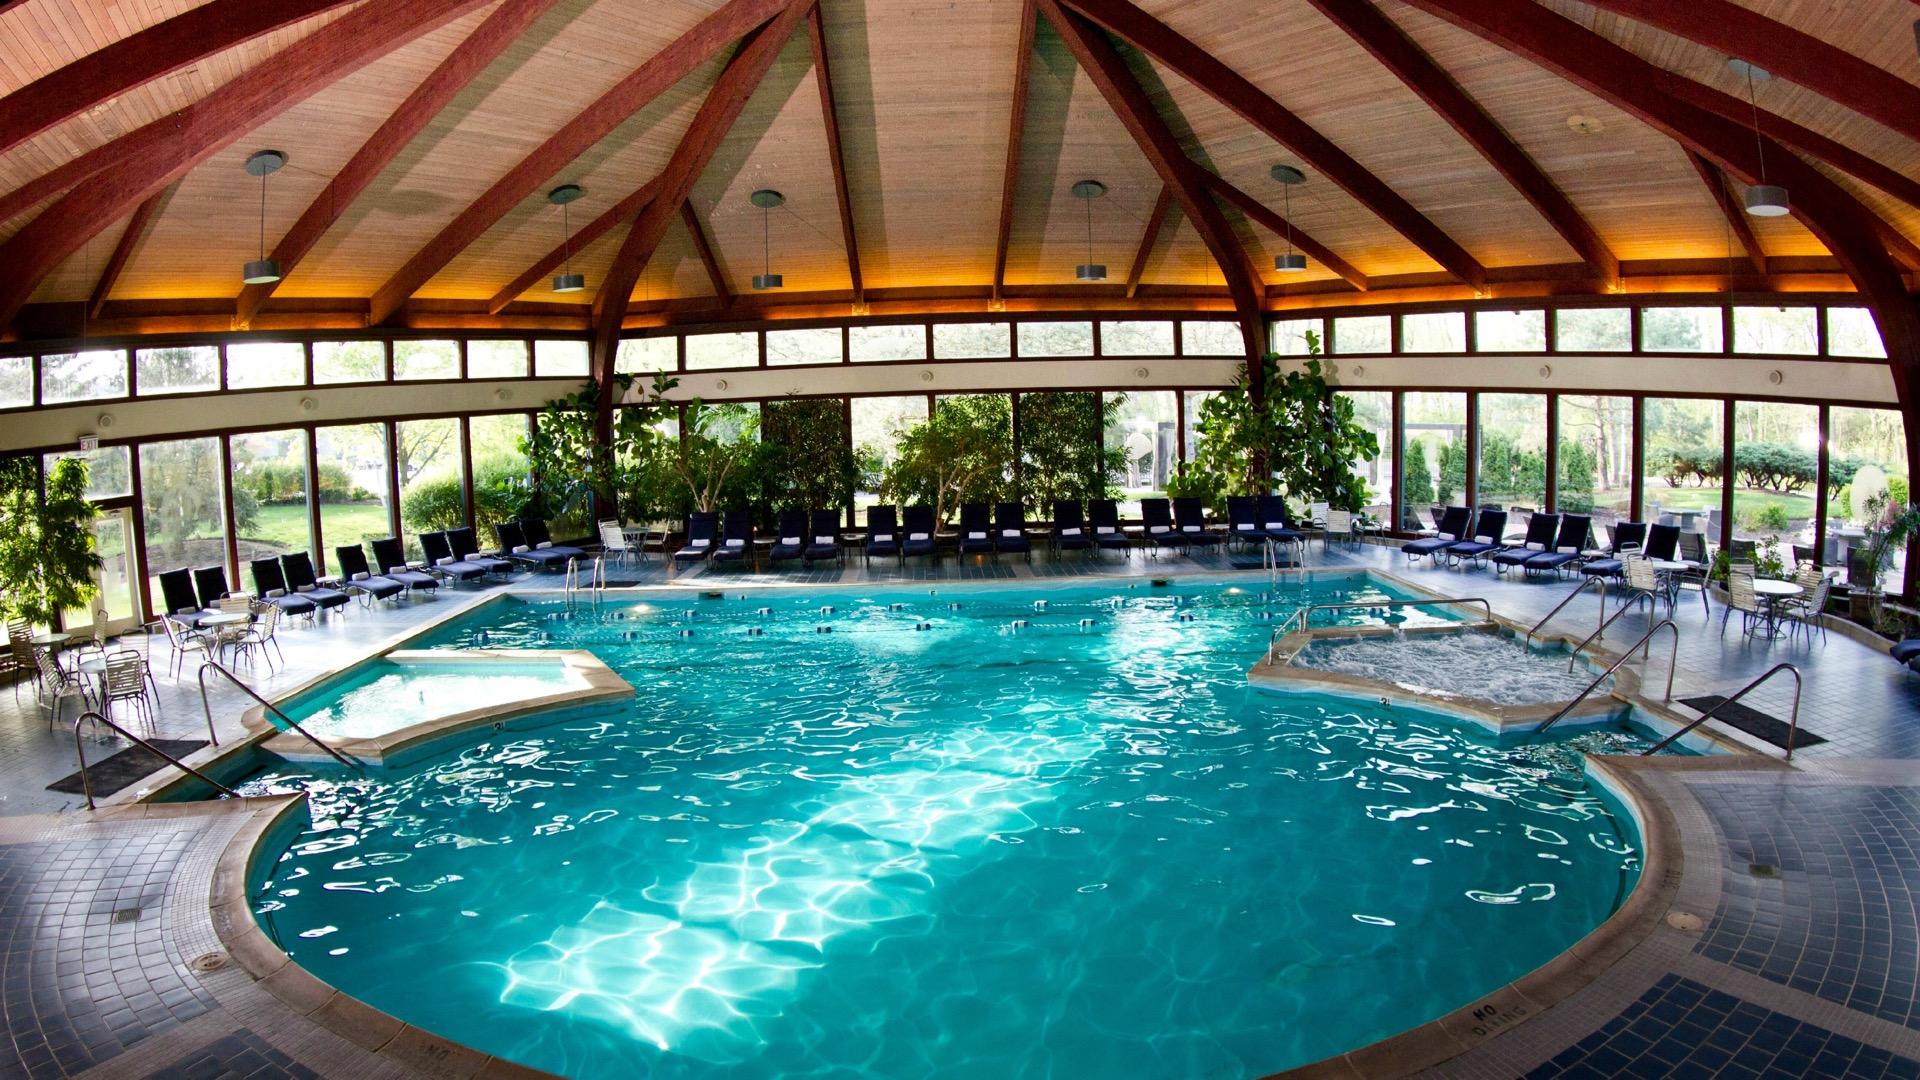 Avanti Spa, The Abbey Resort, Spas of America | Spas of ...